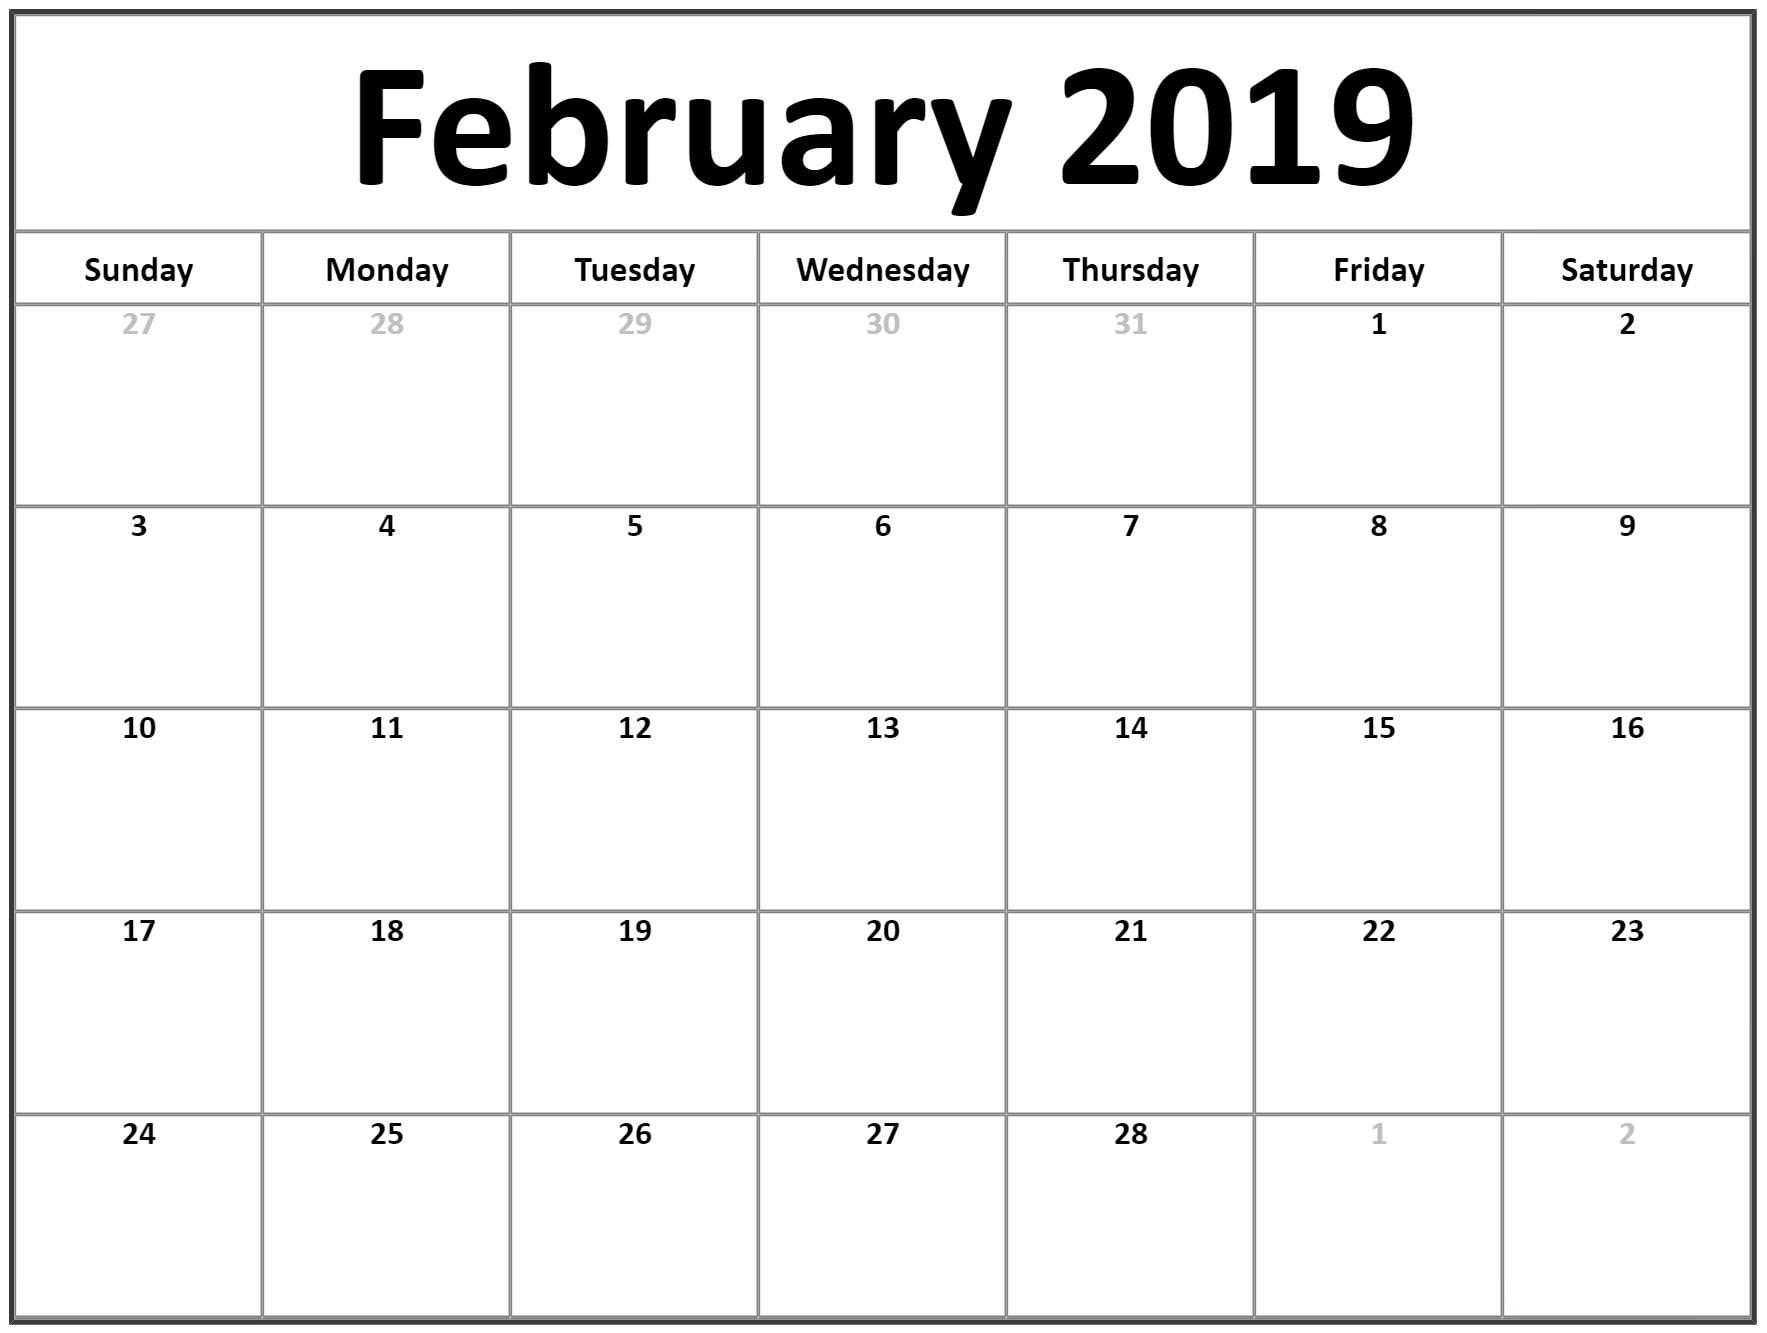 February 2019 Free Printable Weekly Calendar Blank Calendar February 2019   Free Printable Calendar, Templates